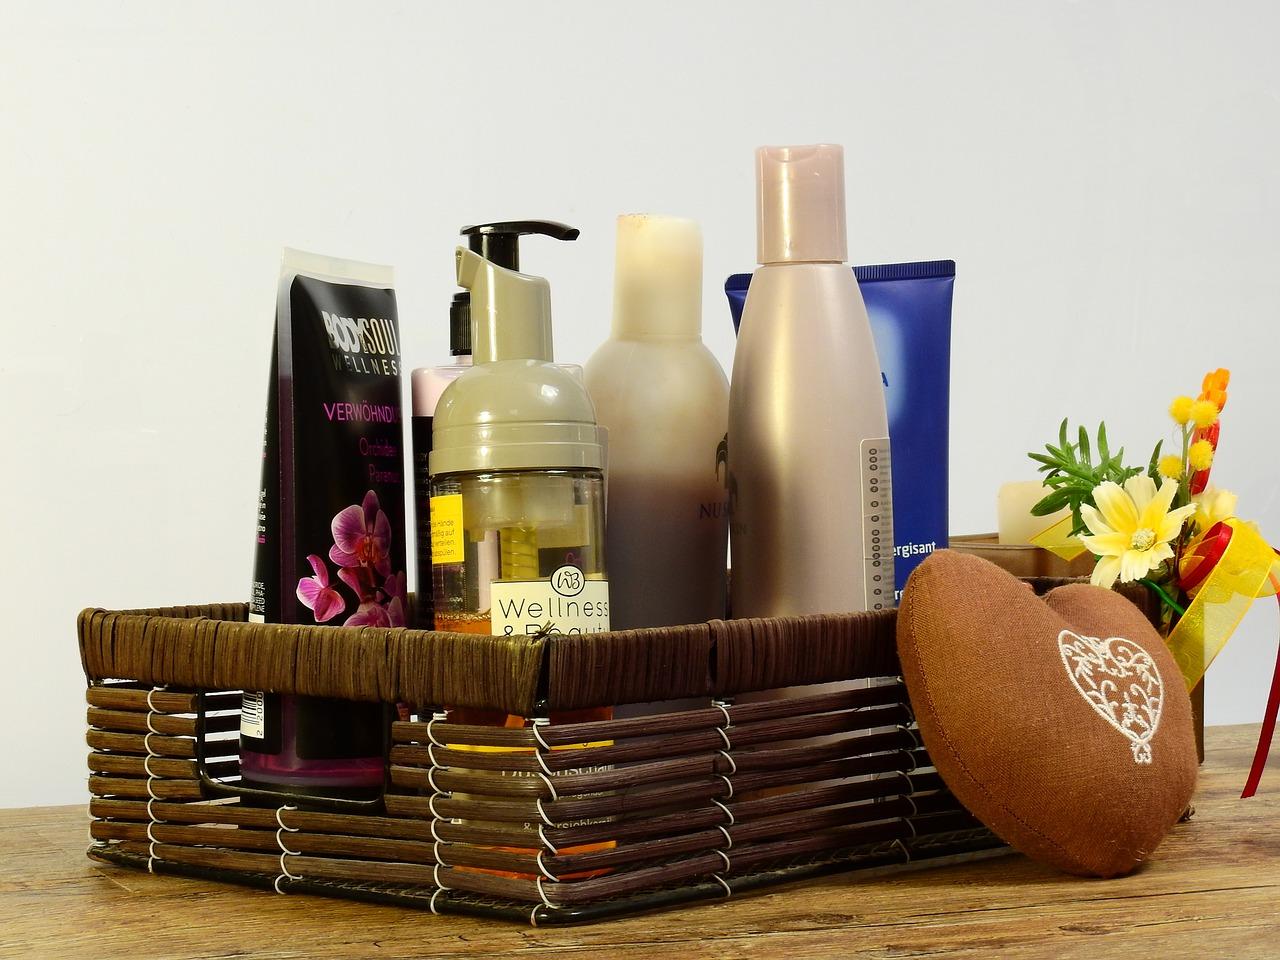 Mauvaise odeur salle de bain stunning clapet anti retour for Mauvaise odeur dans la salle de bain